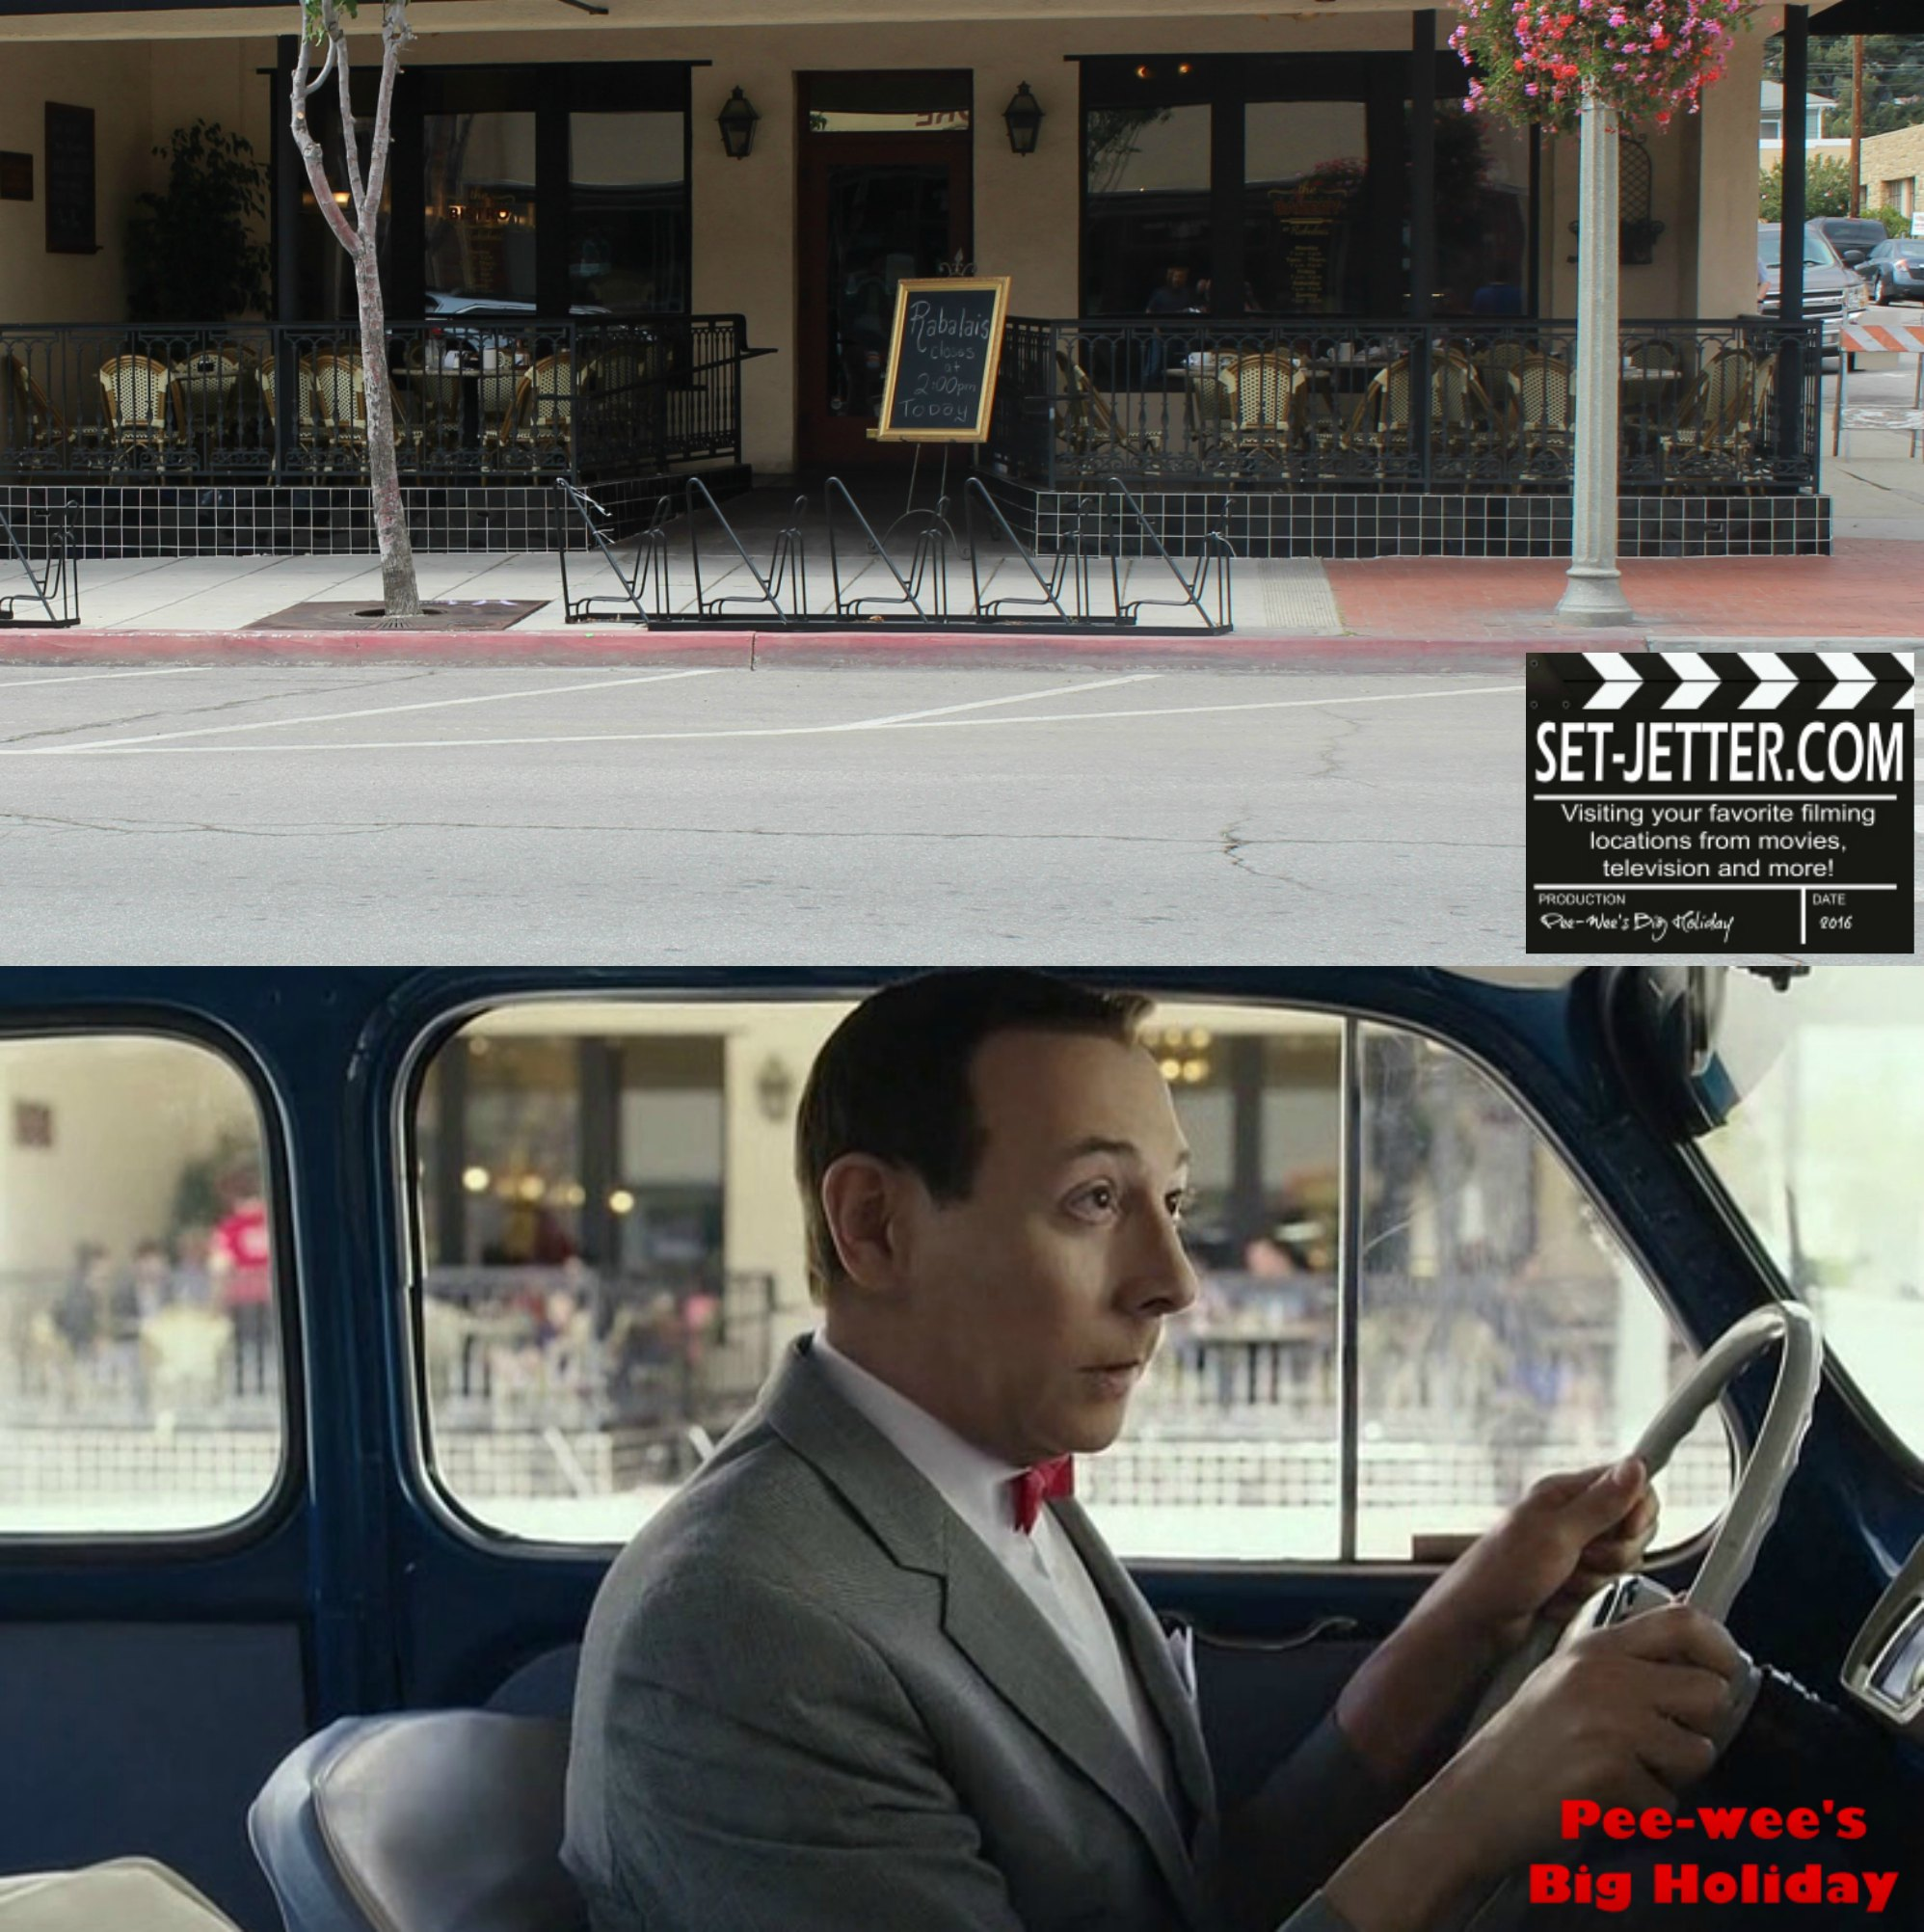 Pee Wee's Big Holiday comparison 341.jpg